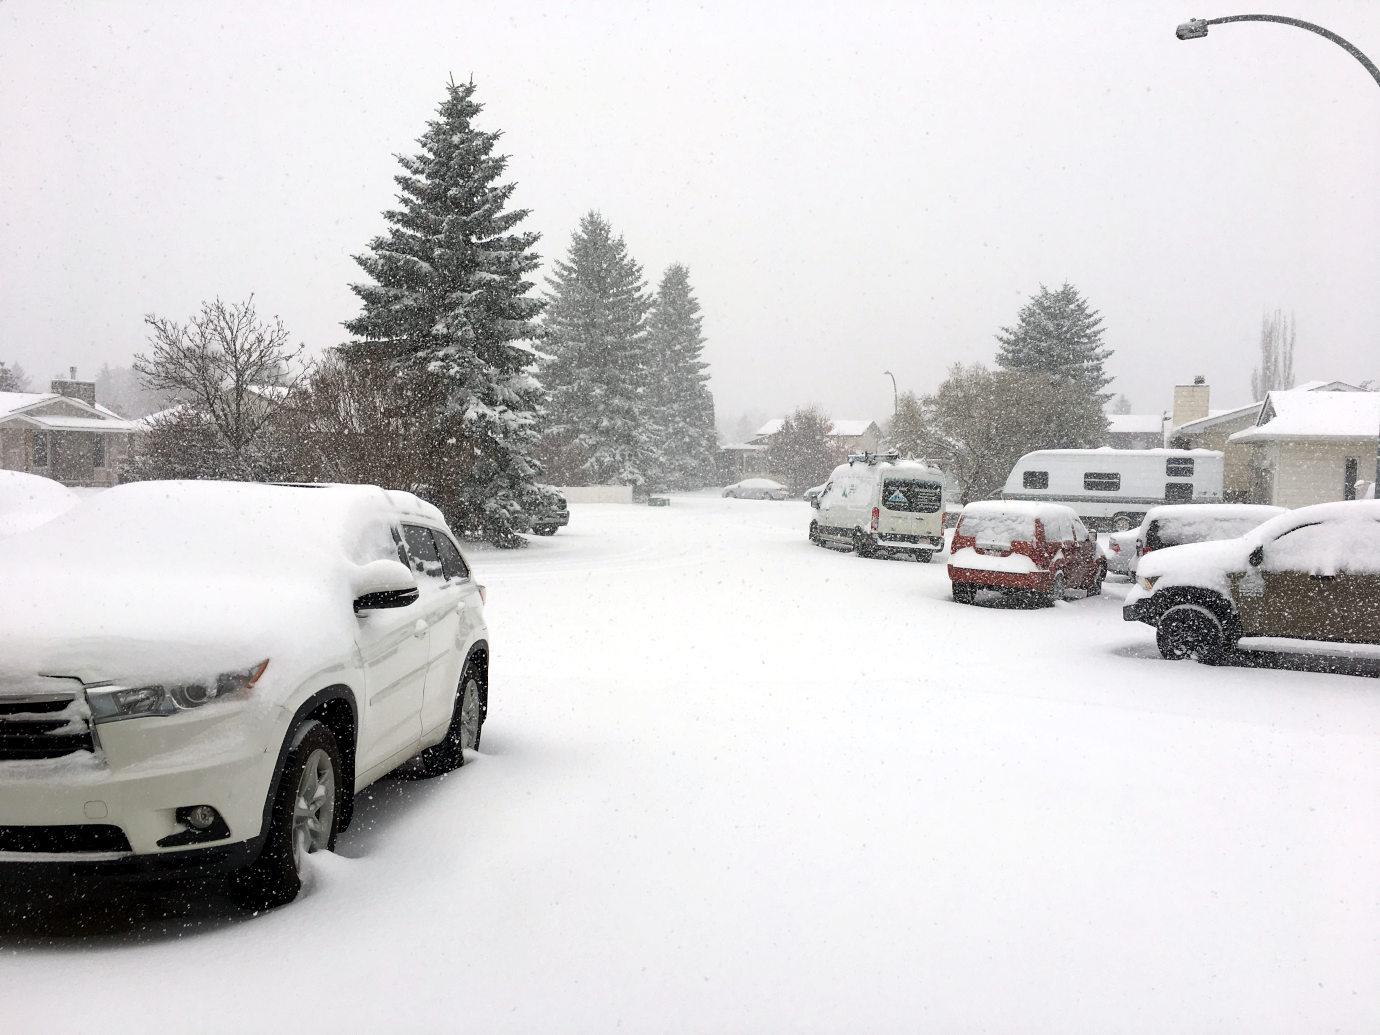 Snowfall in Edmonton in winter